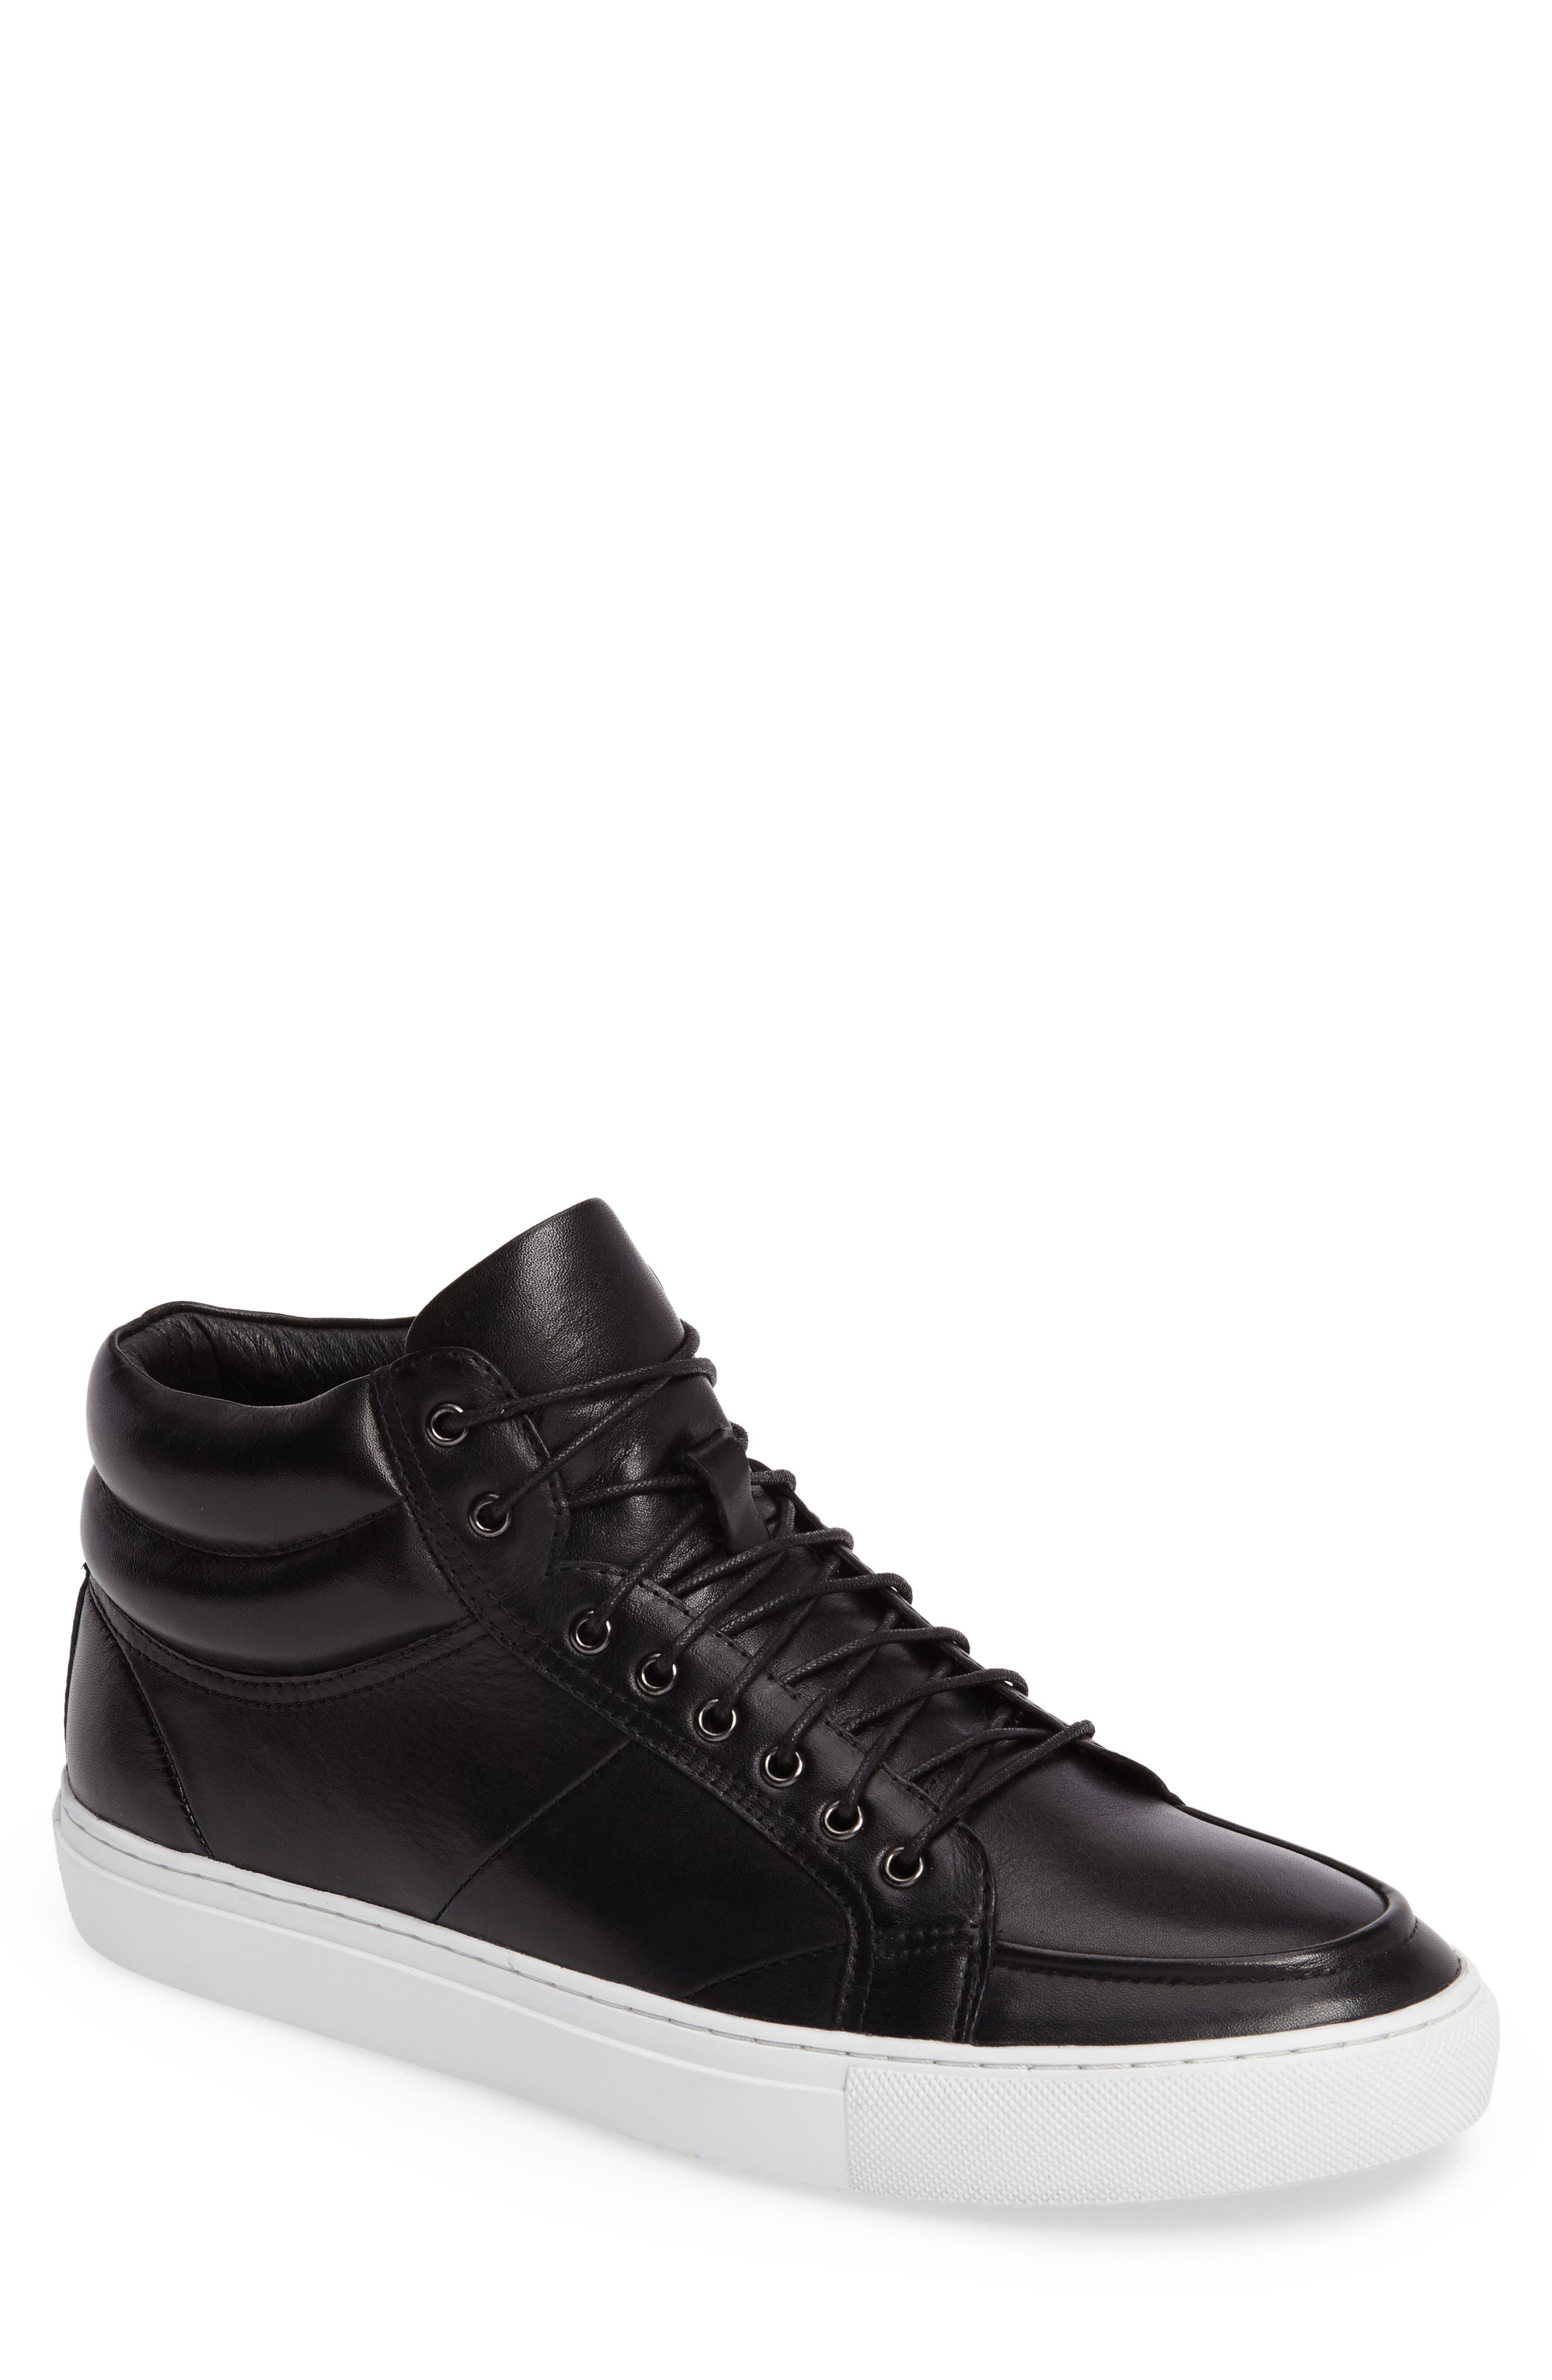 Zanzara Clef Sneaker (Men)